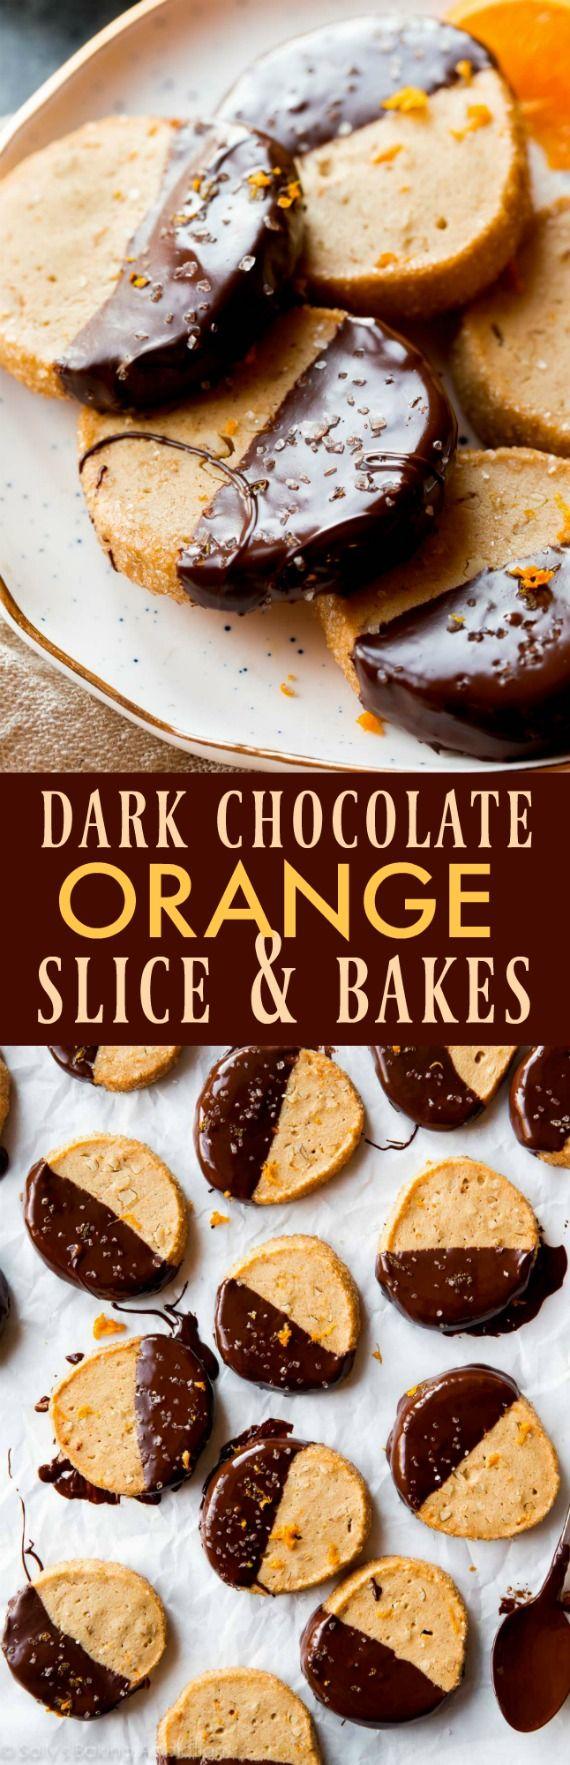 Dark Chocolate Orange Slice & Bake Cookies Recipe